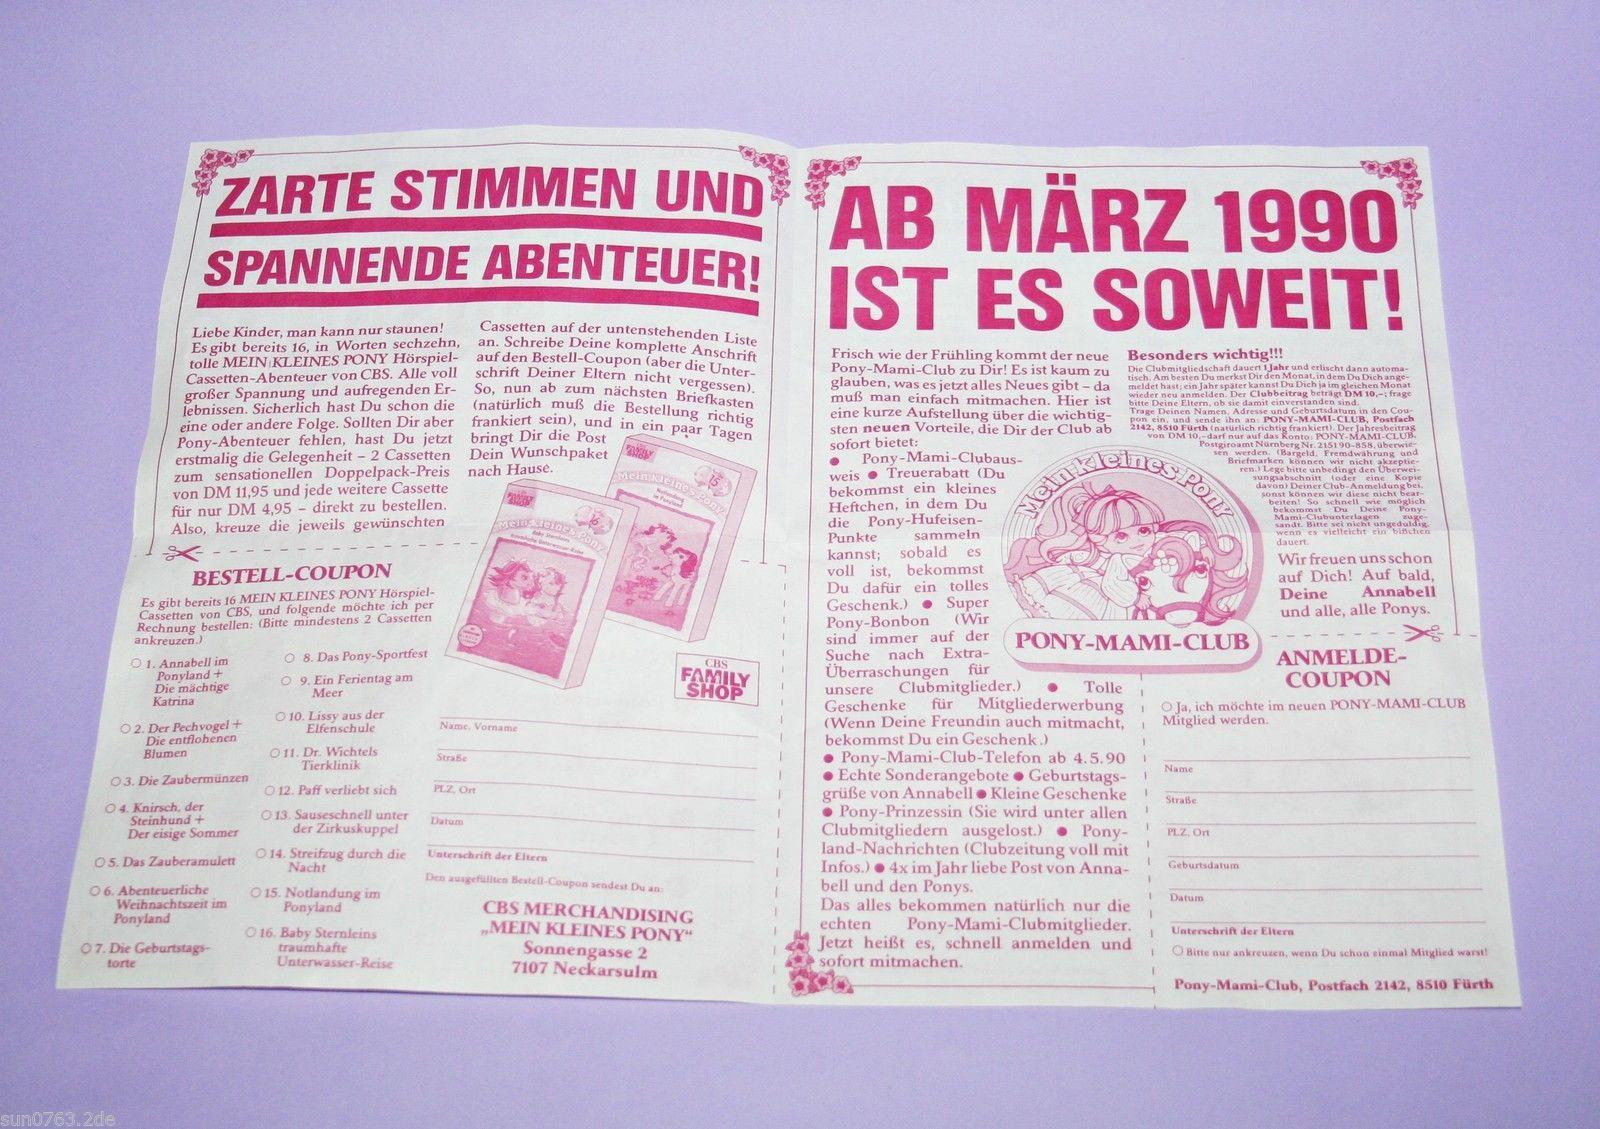 My Little Pony G1 Pony Land Nachrichten / German Pony Fan Club News | eBay